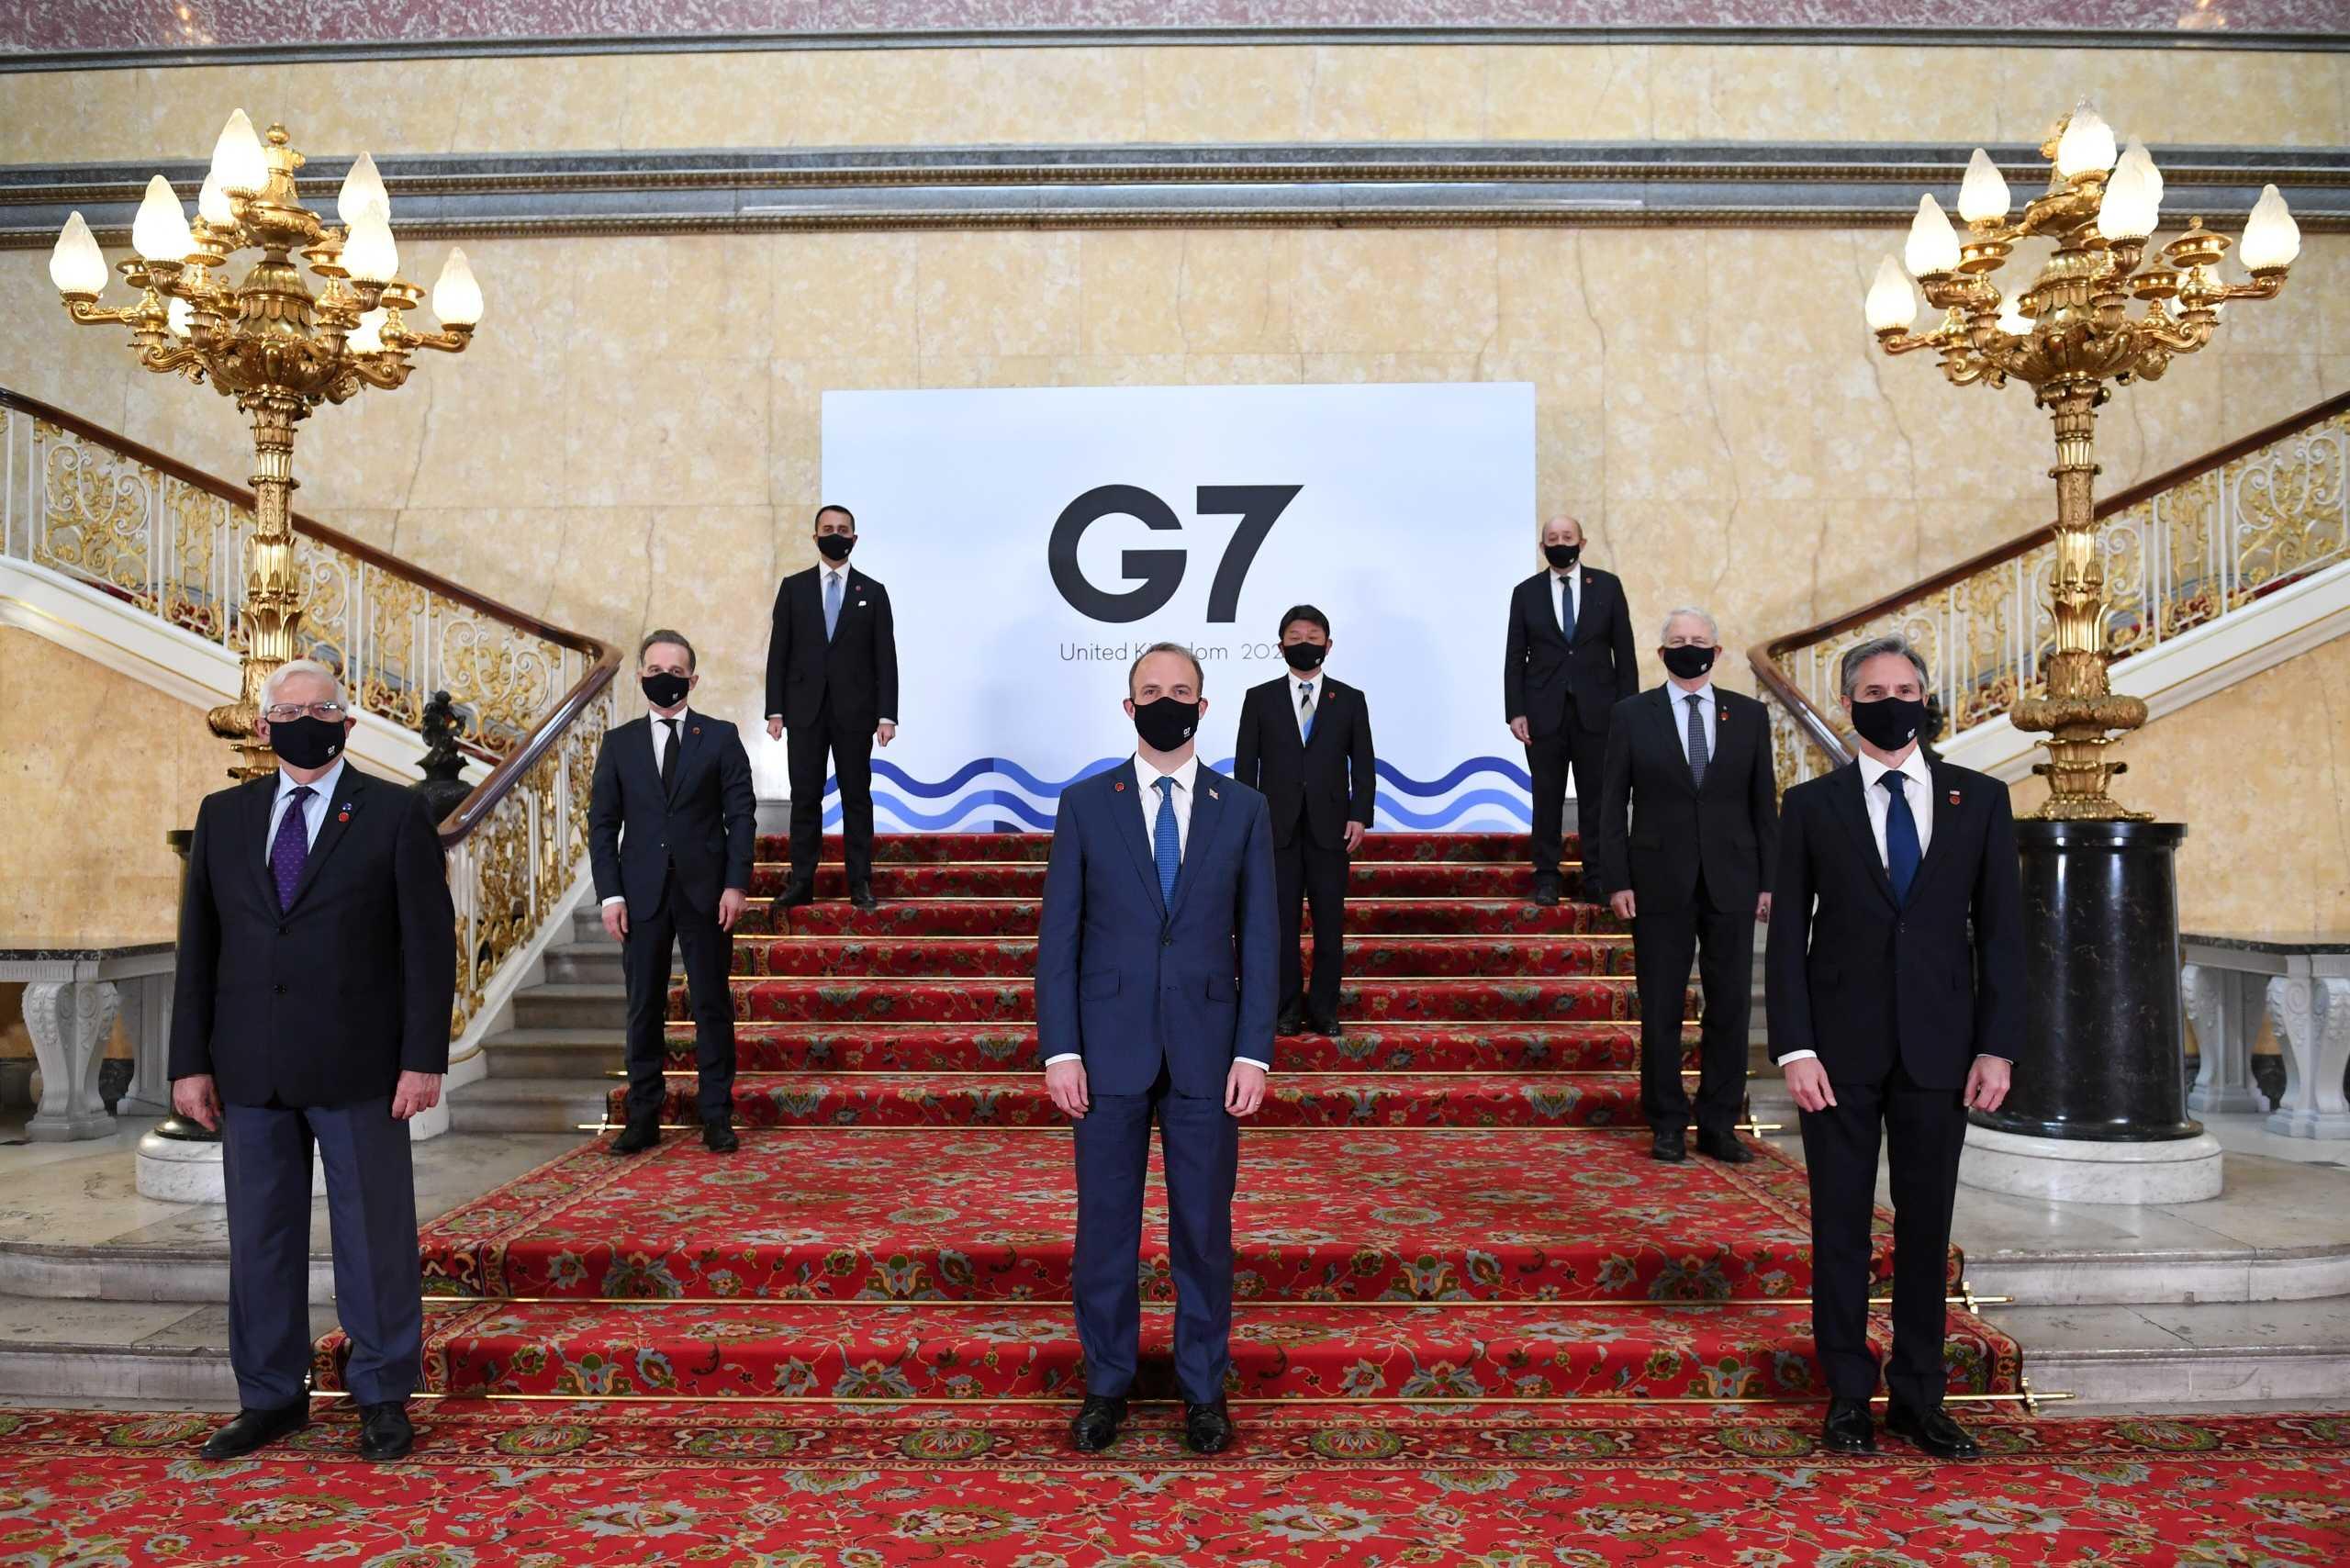 G7: Οι αυξανόμενες απειλές Ρωσίας και Κίνας στη ατζέντα των συζητήσεων